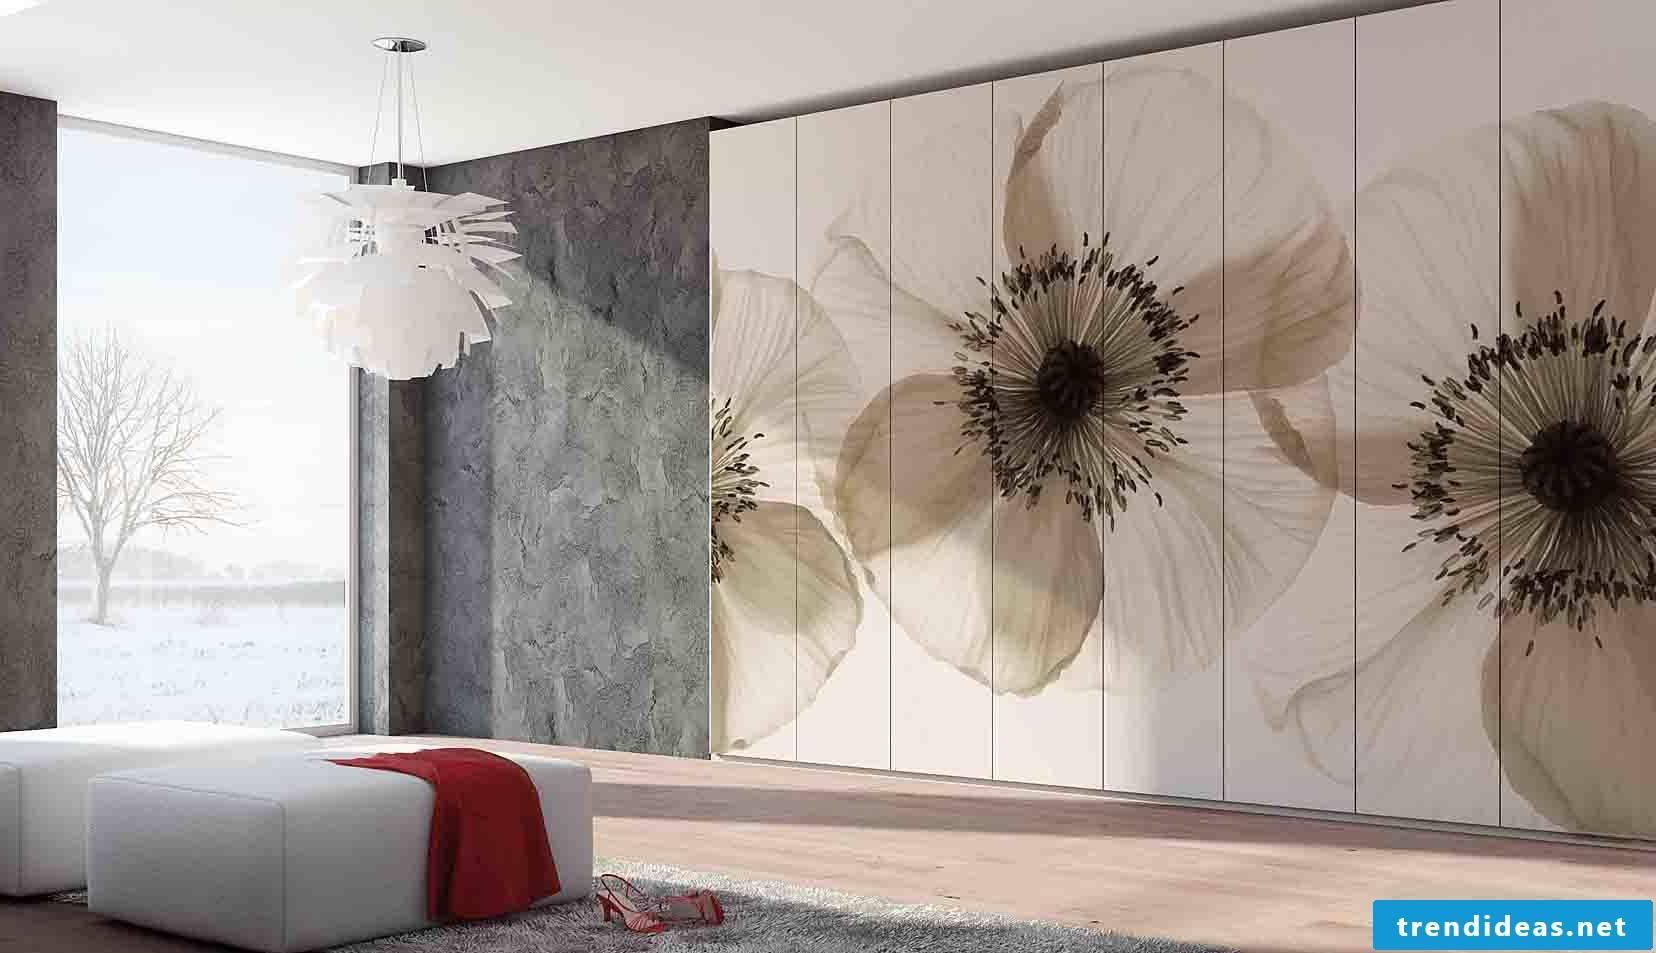 Flowery living room wall